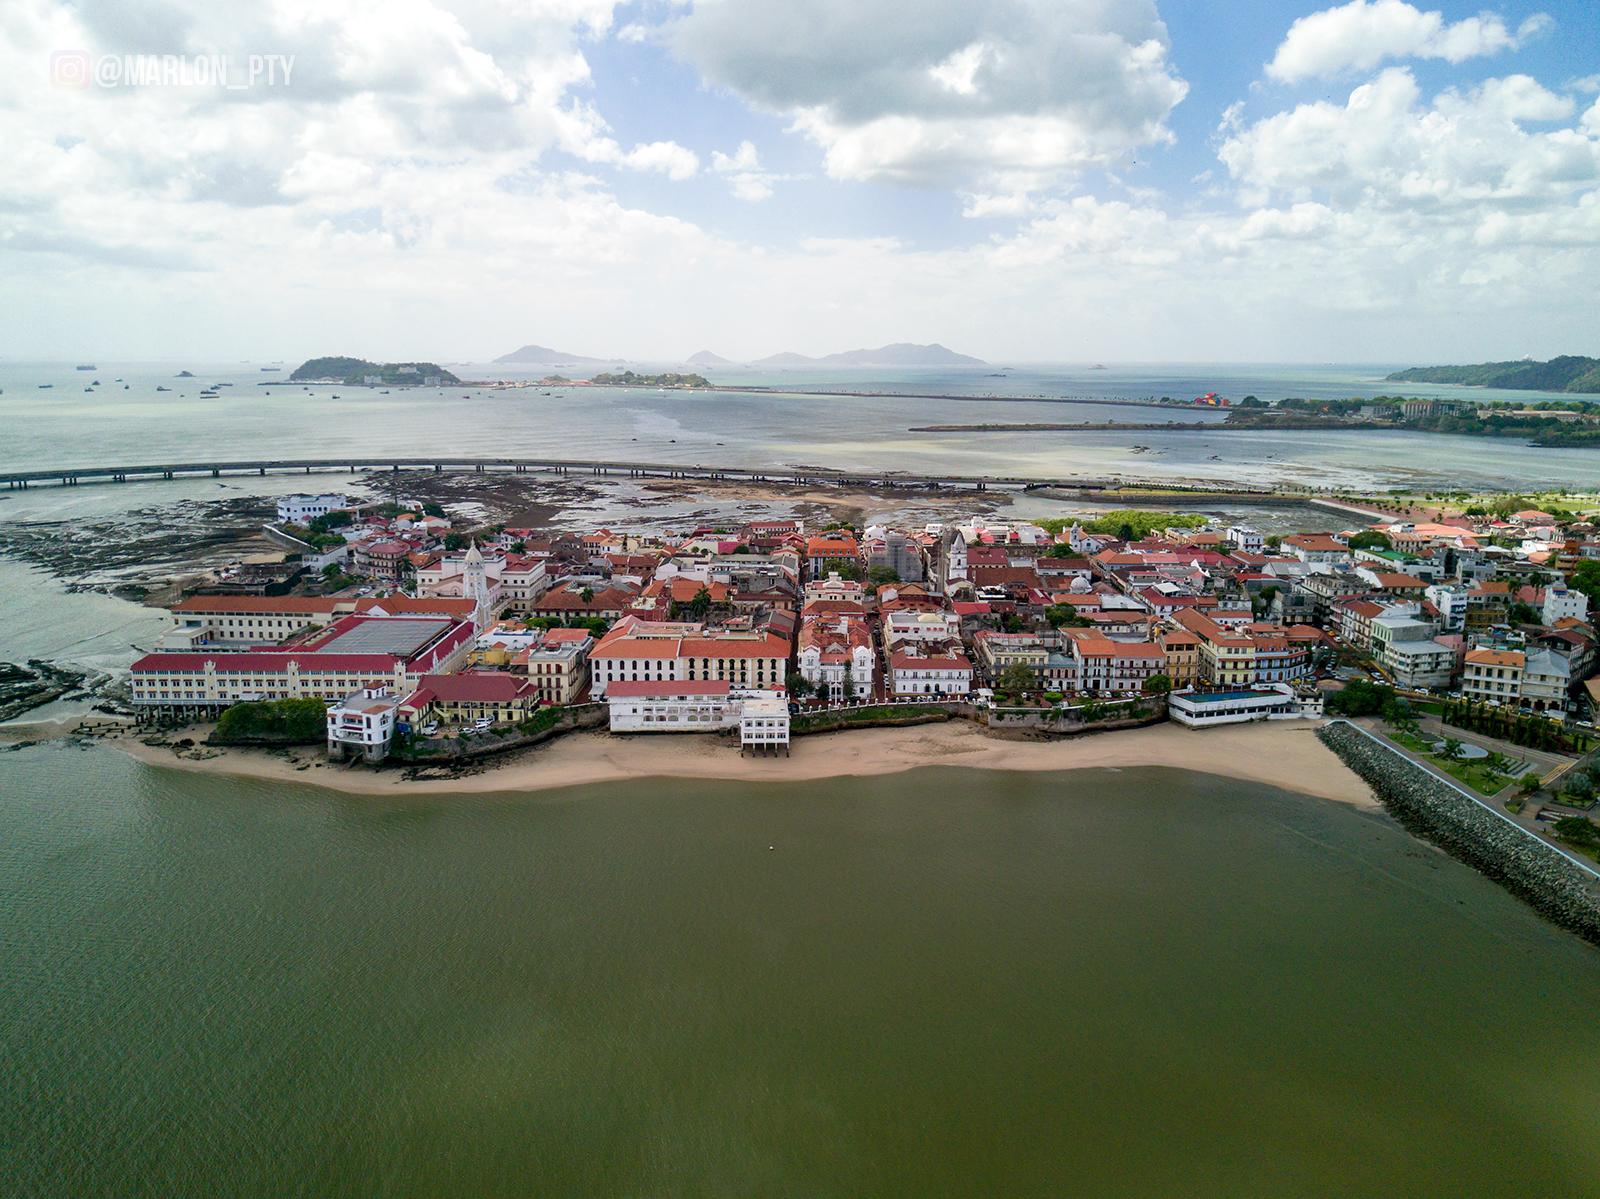 Bird's eye view of Casco Viejo, Panamá. Photo: Marlon I. Torres